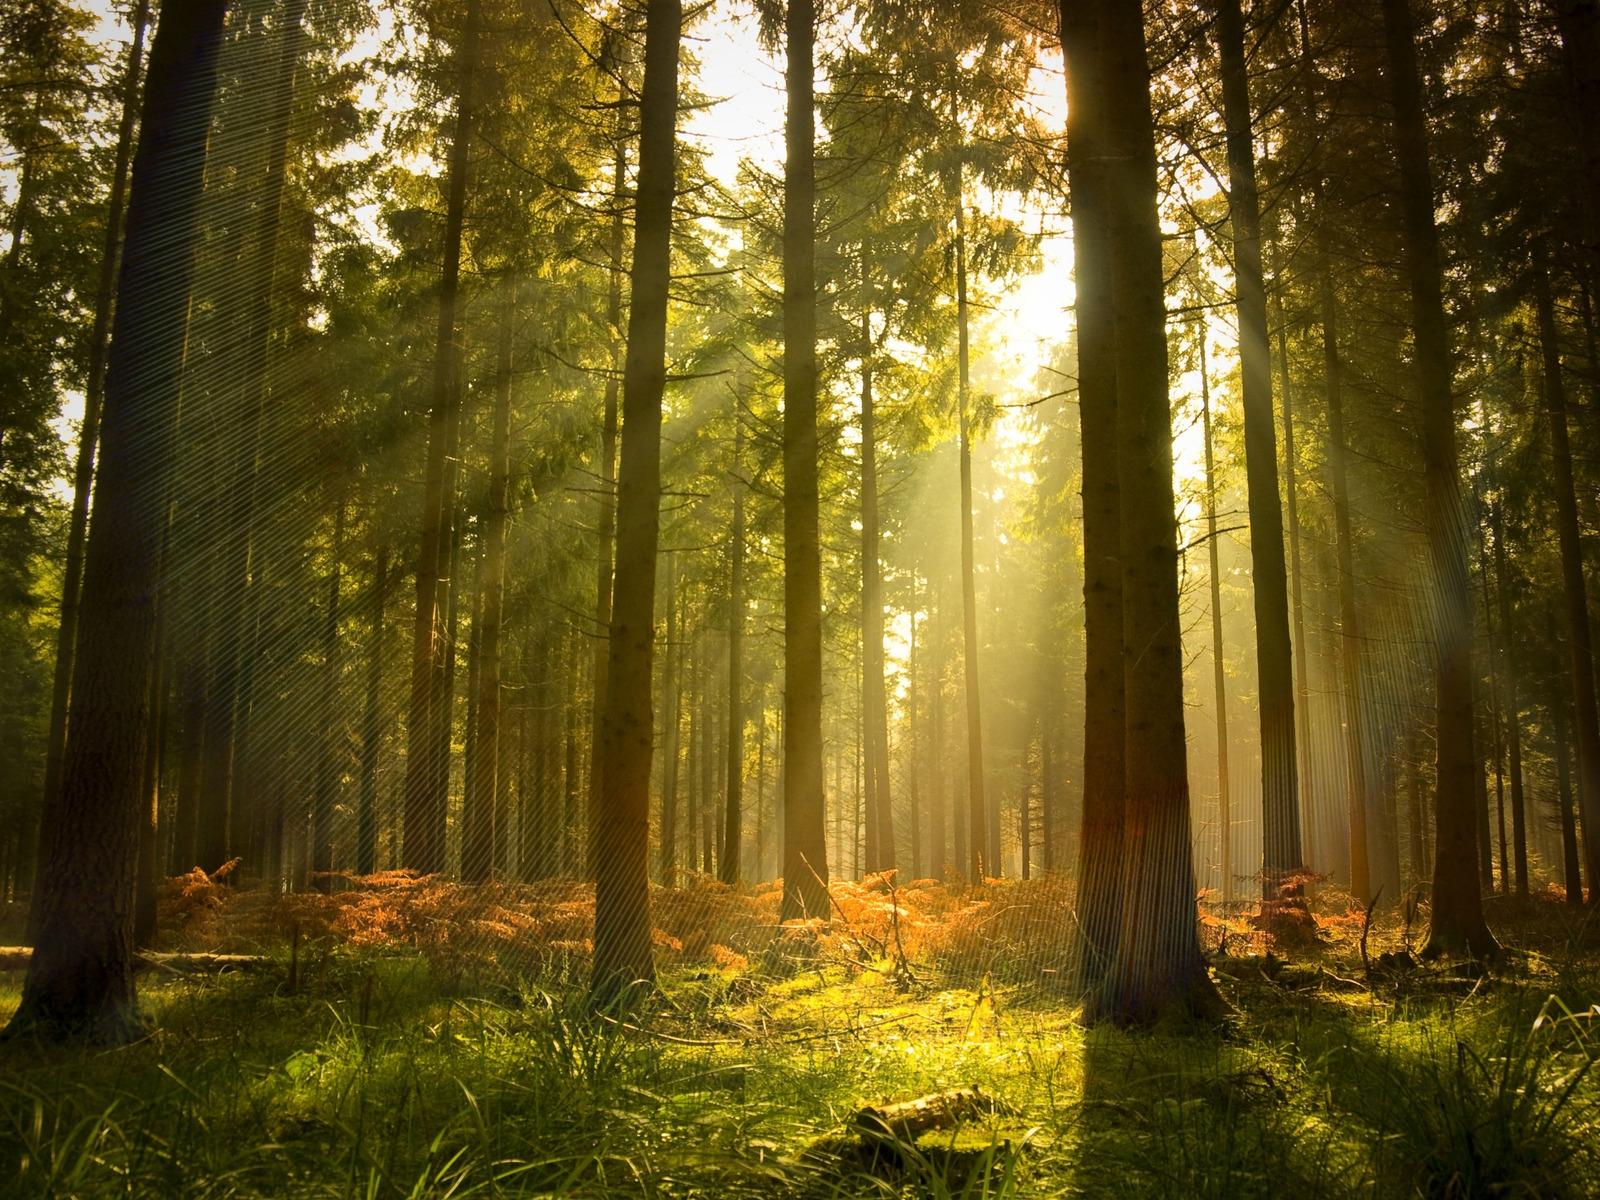 Pine Forest · Pine Forest · Pine Forest Wallpaper ...